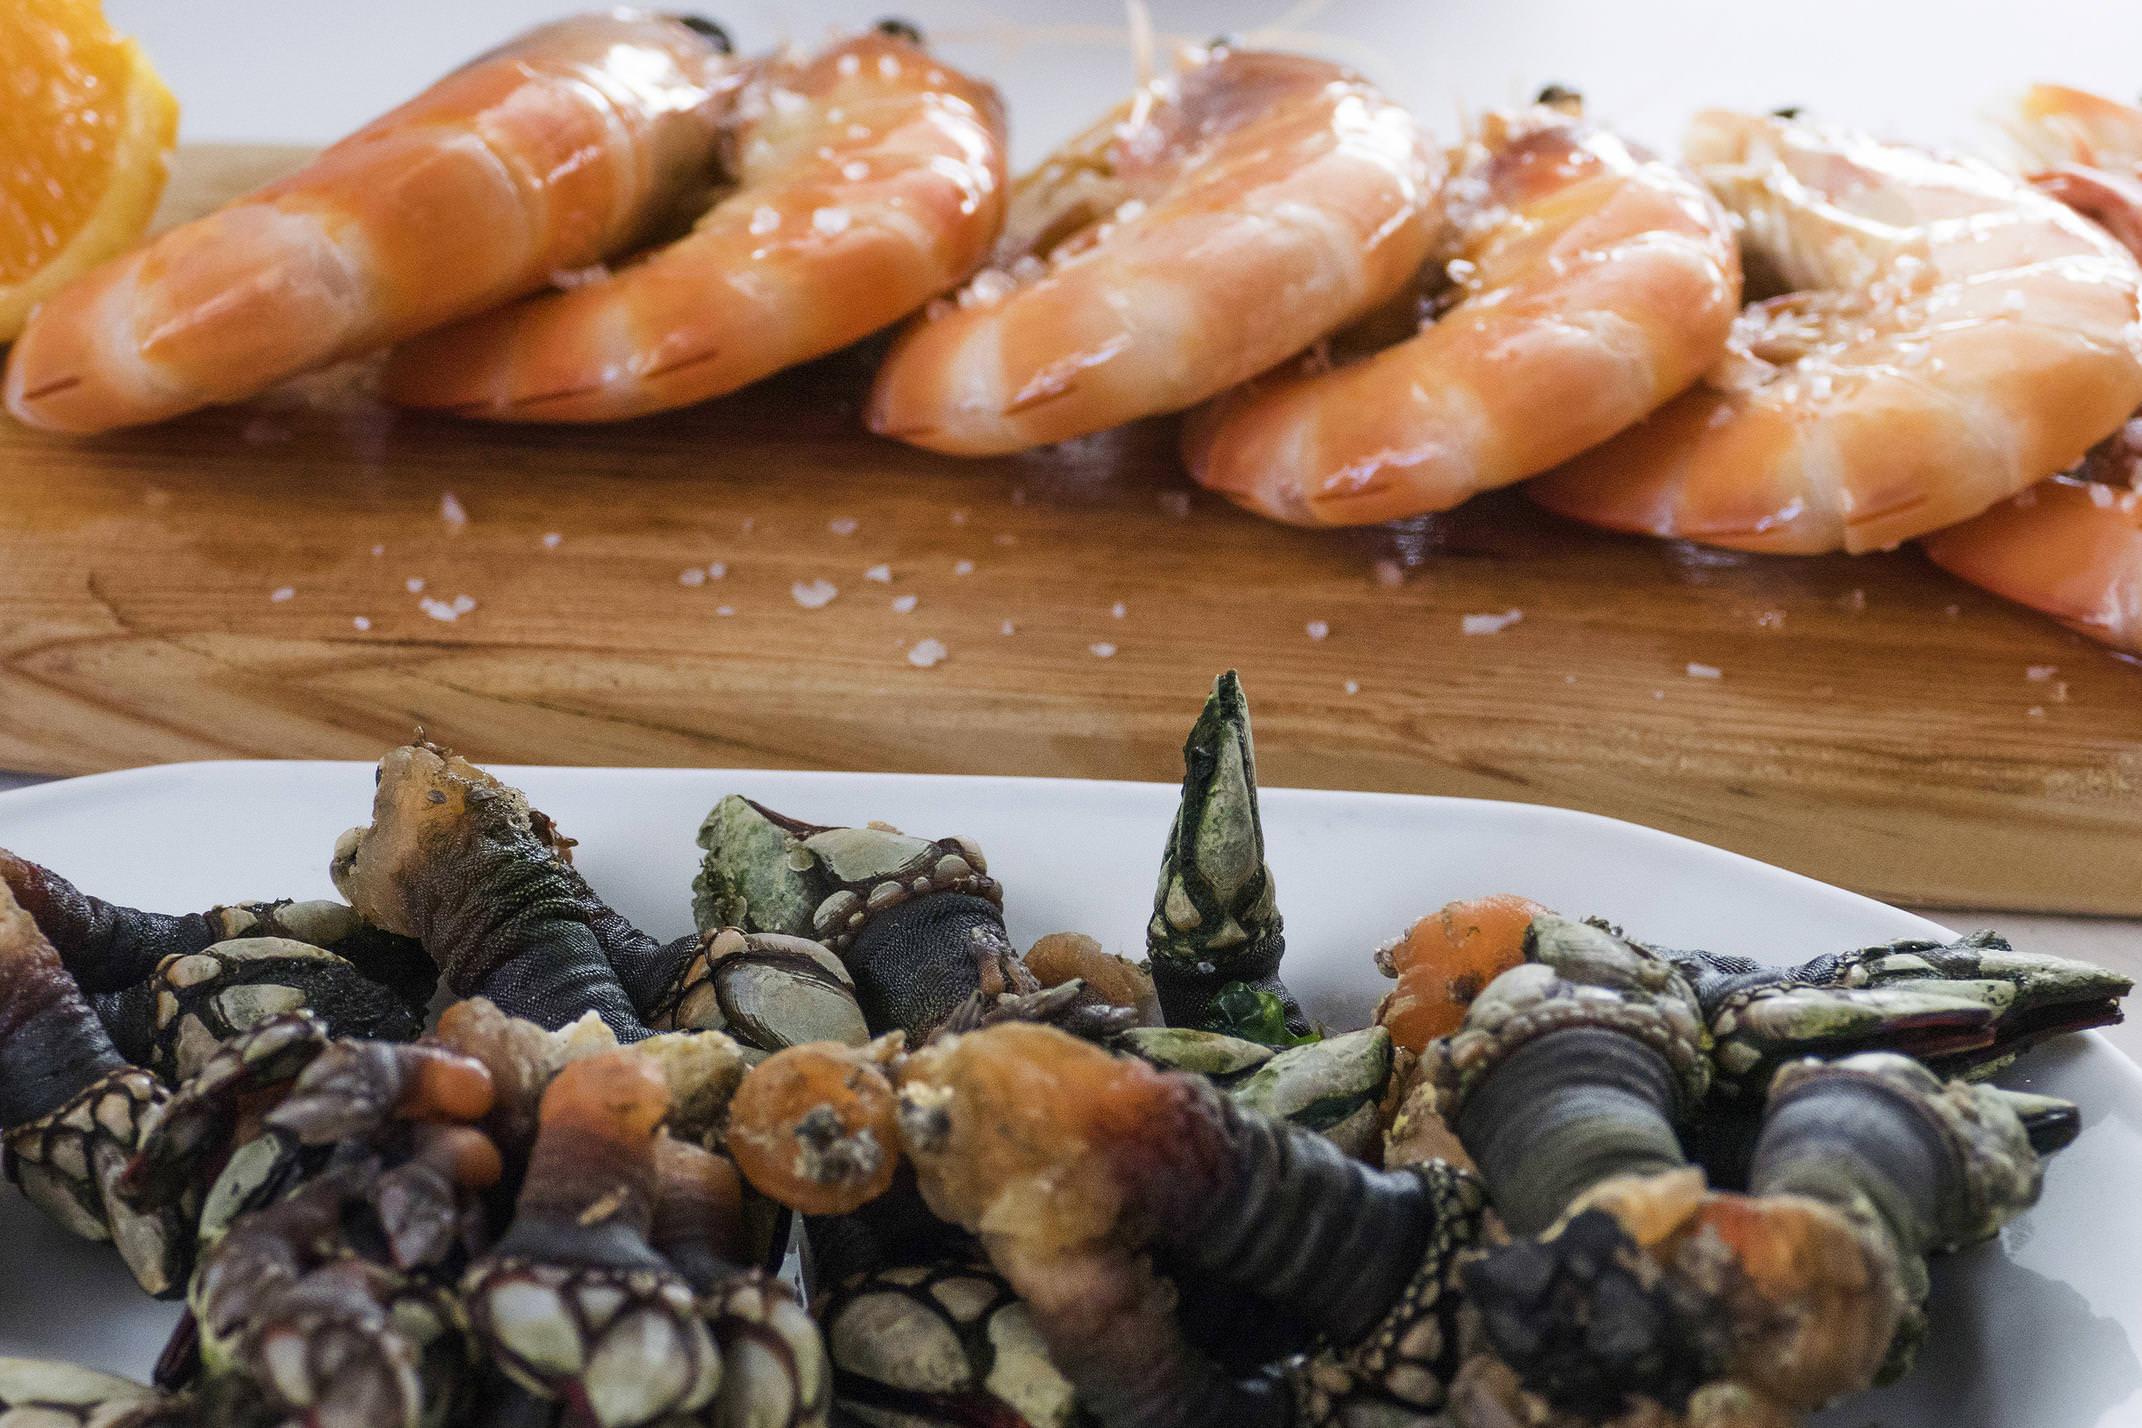 Portugal alentejo rota vicentina zambujeira seafood goose barnacles langostines